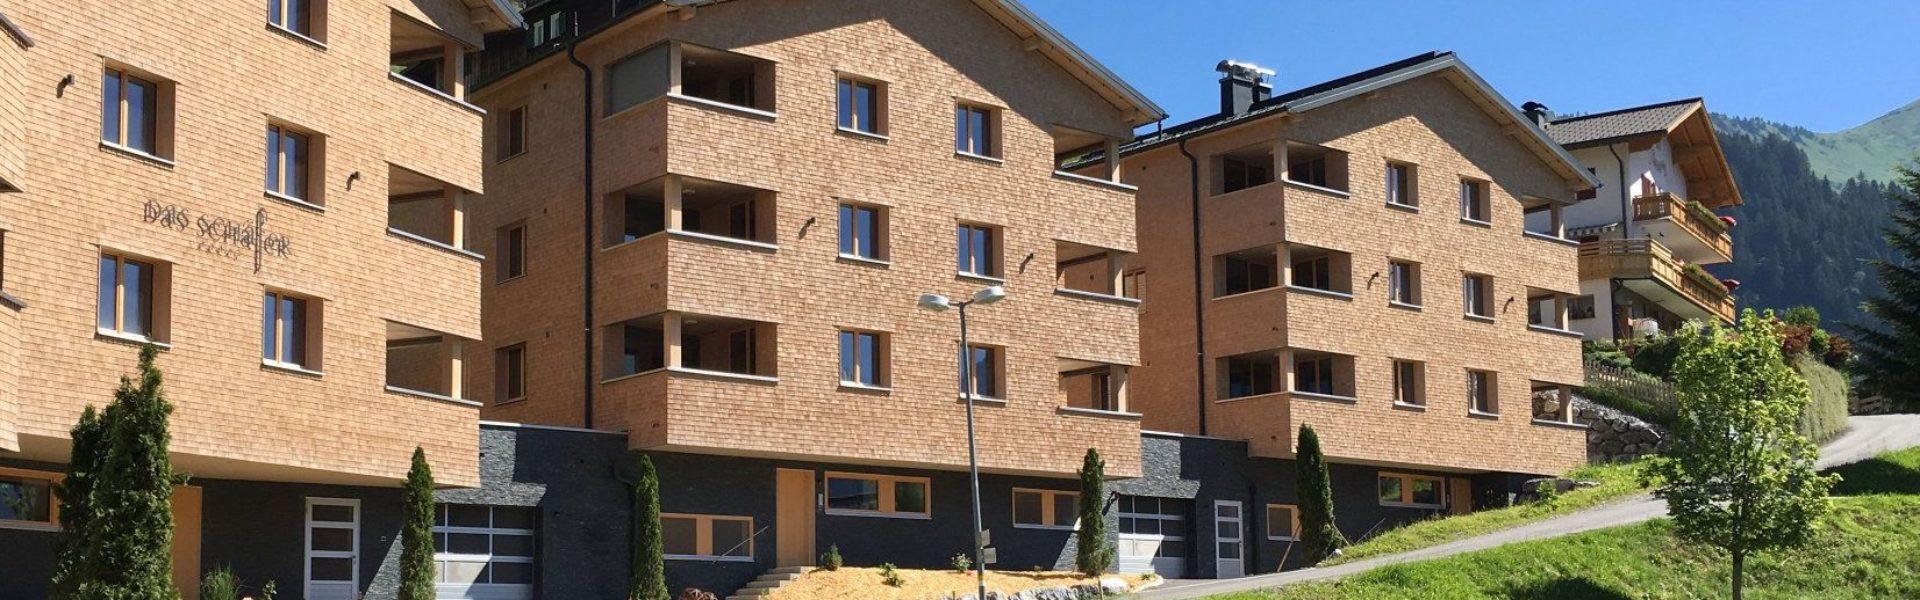 Wellnesshotel Vorarlberg Das Schaefers Grosses Walsertal